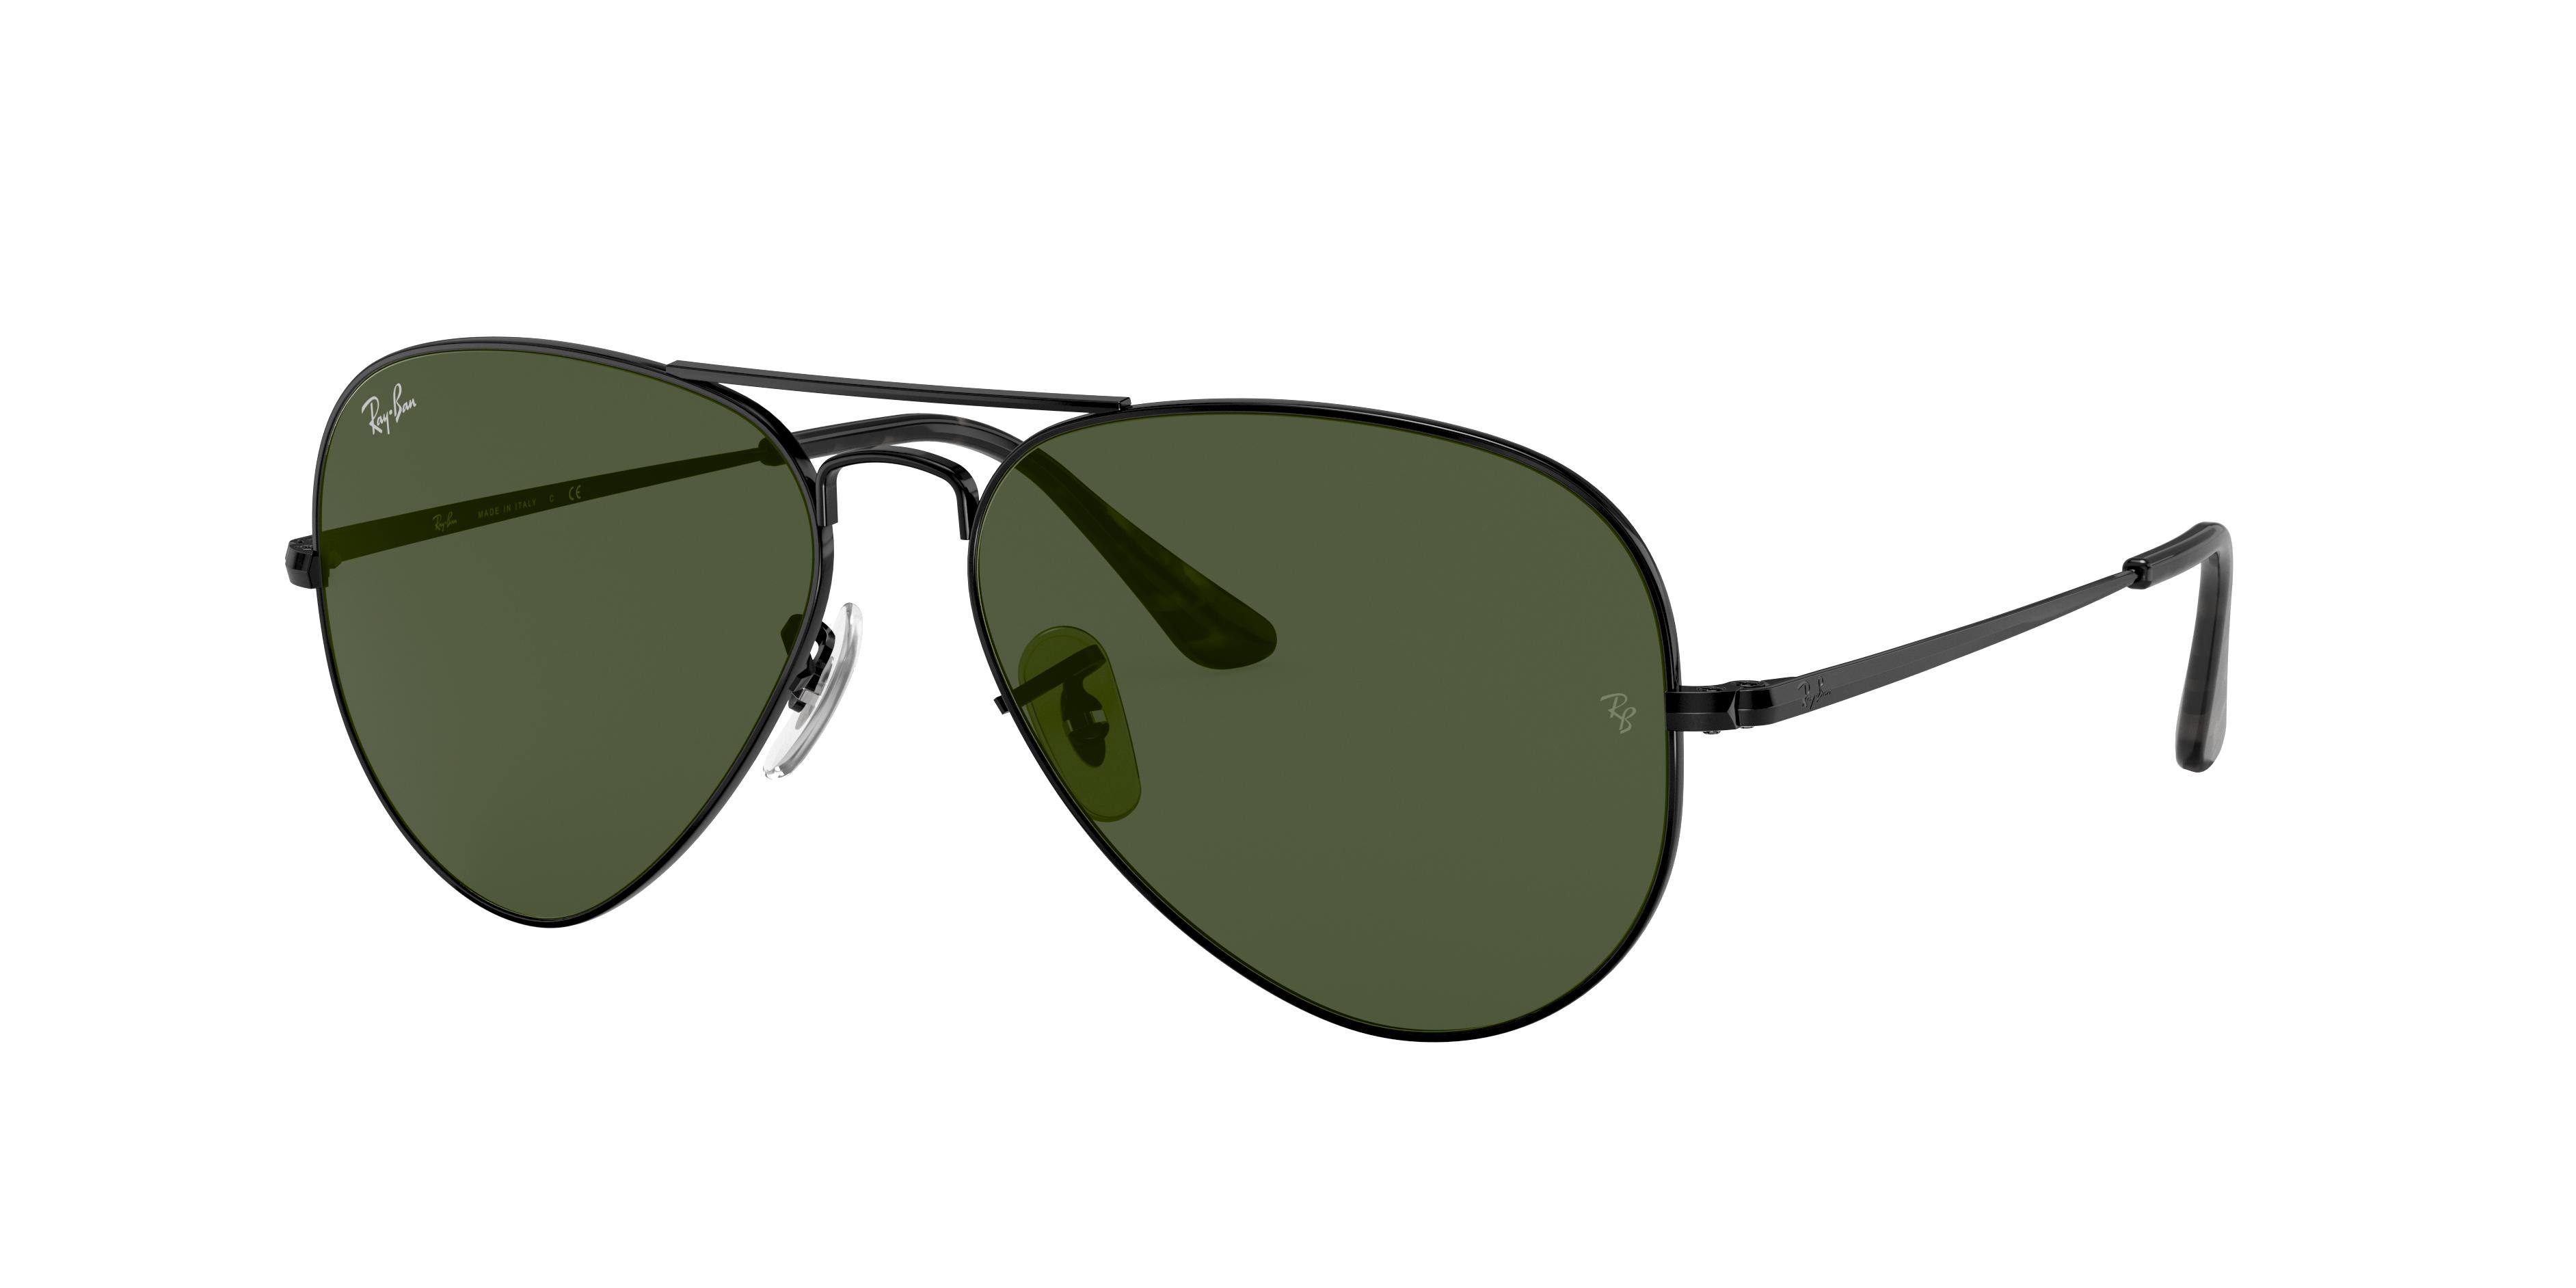 Ray-Ban Rb3689 Black, Green Lenses - RB3689